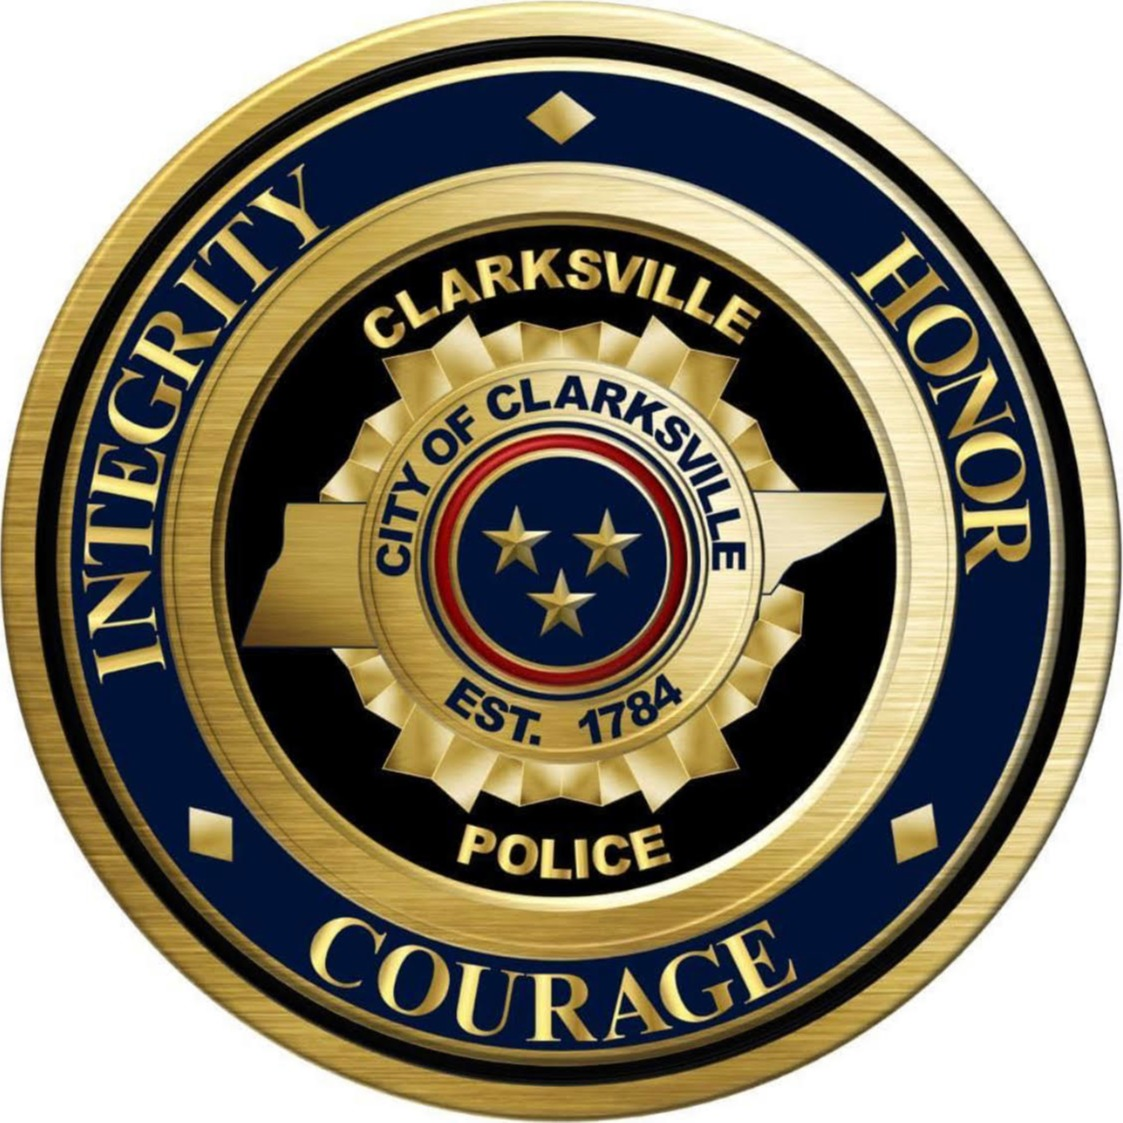 Clarksville Police Department